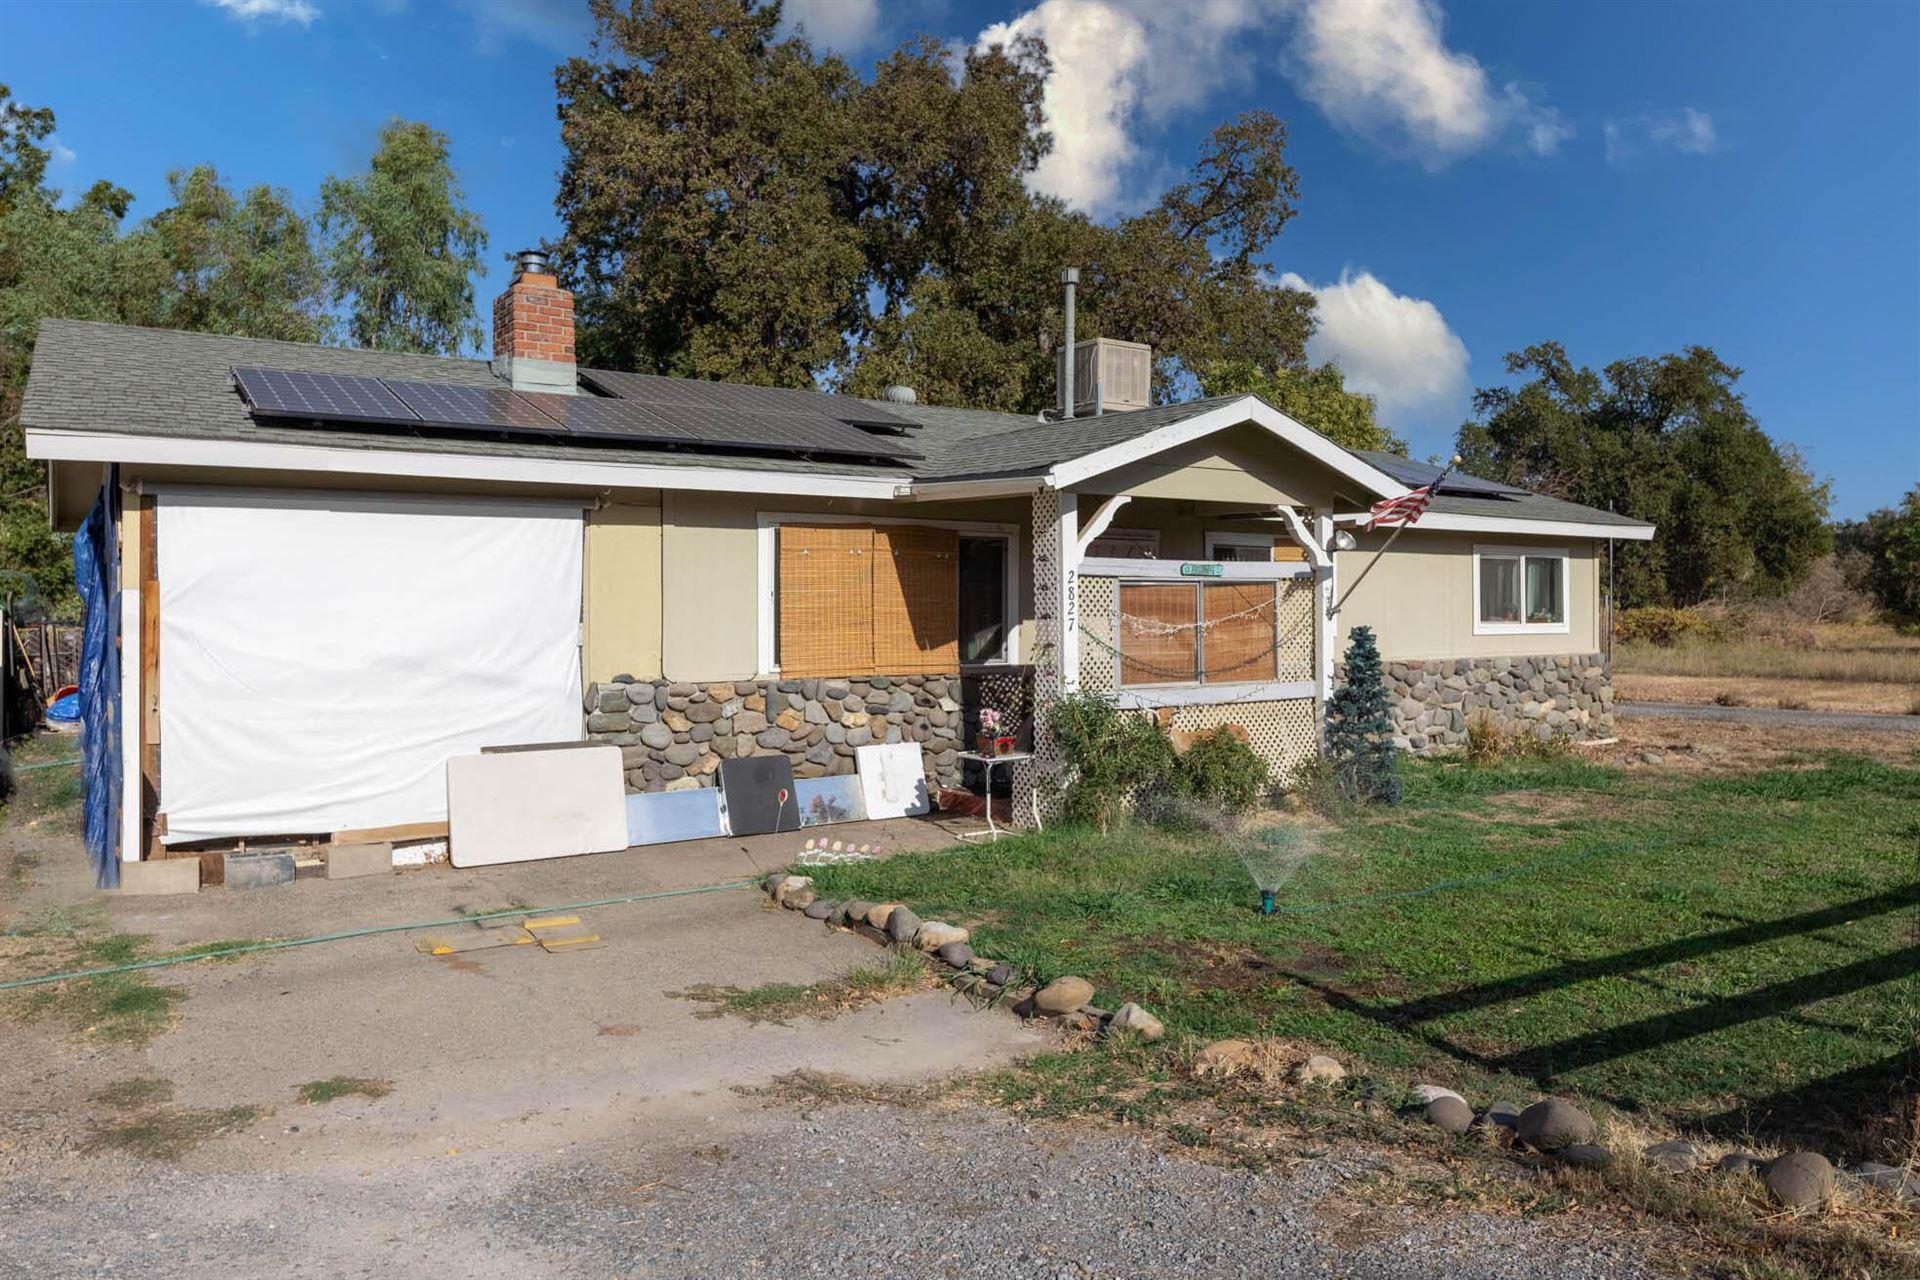 Photo for 2827 Stingy Ln, Anderson, CA 96007 (MLS # 21-4792)